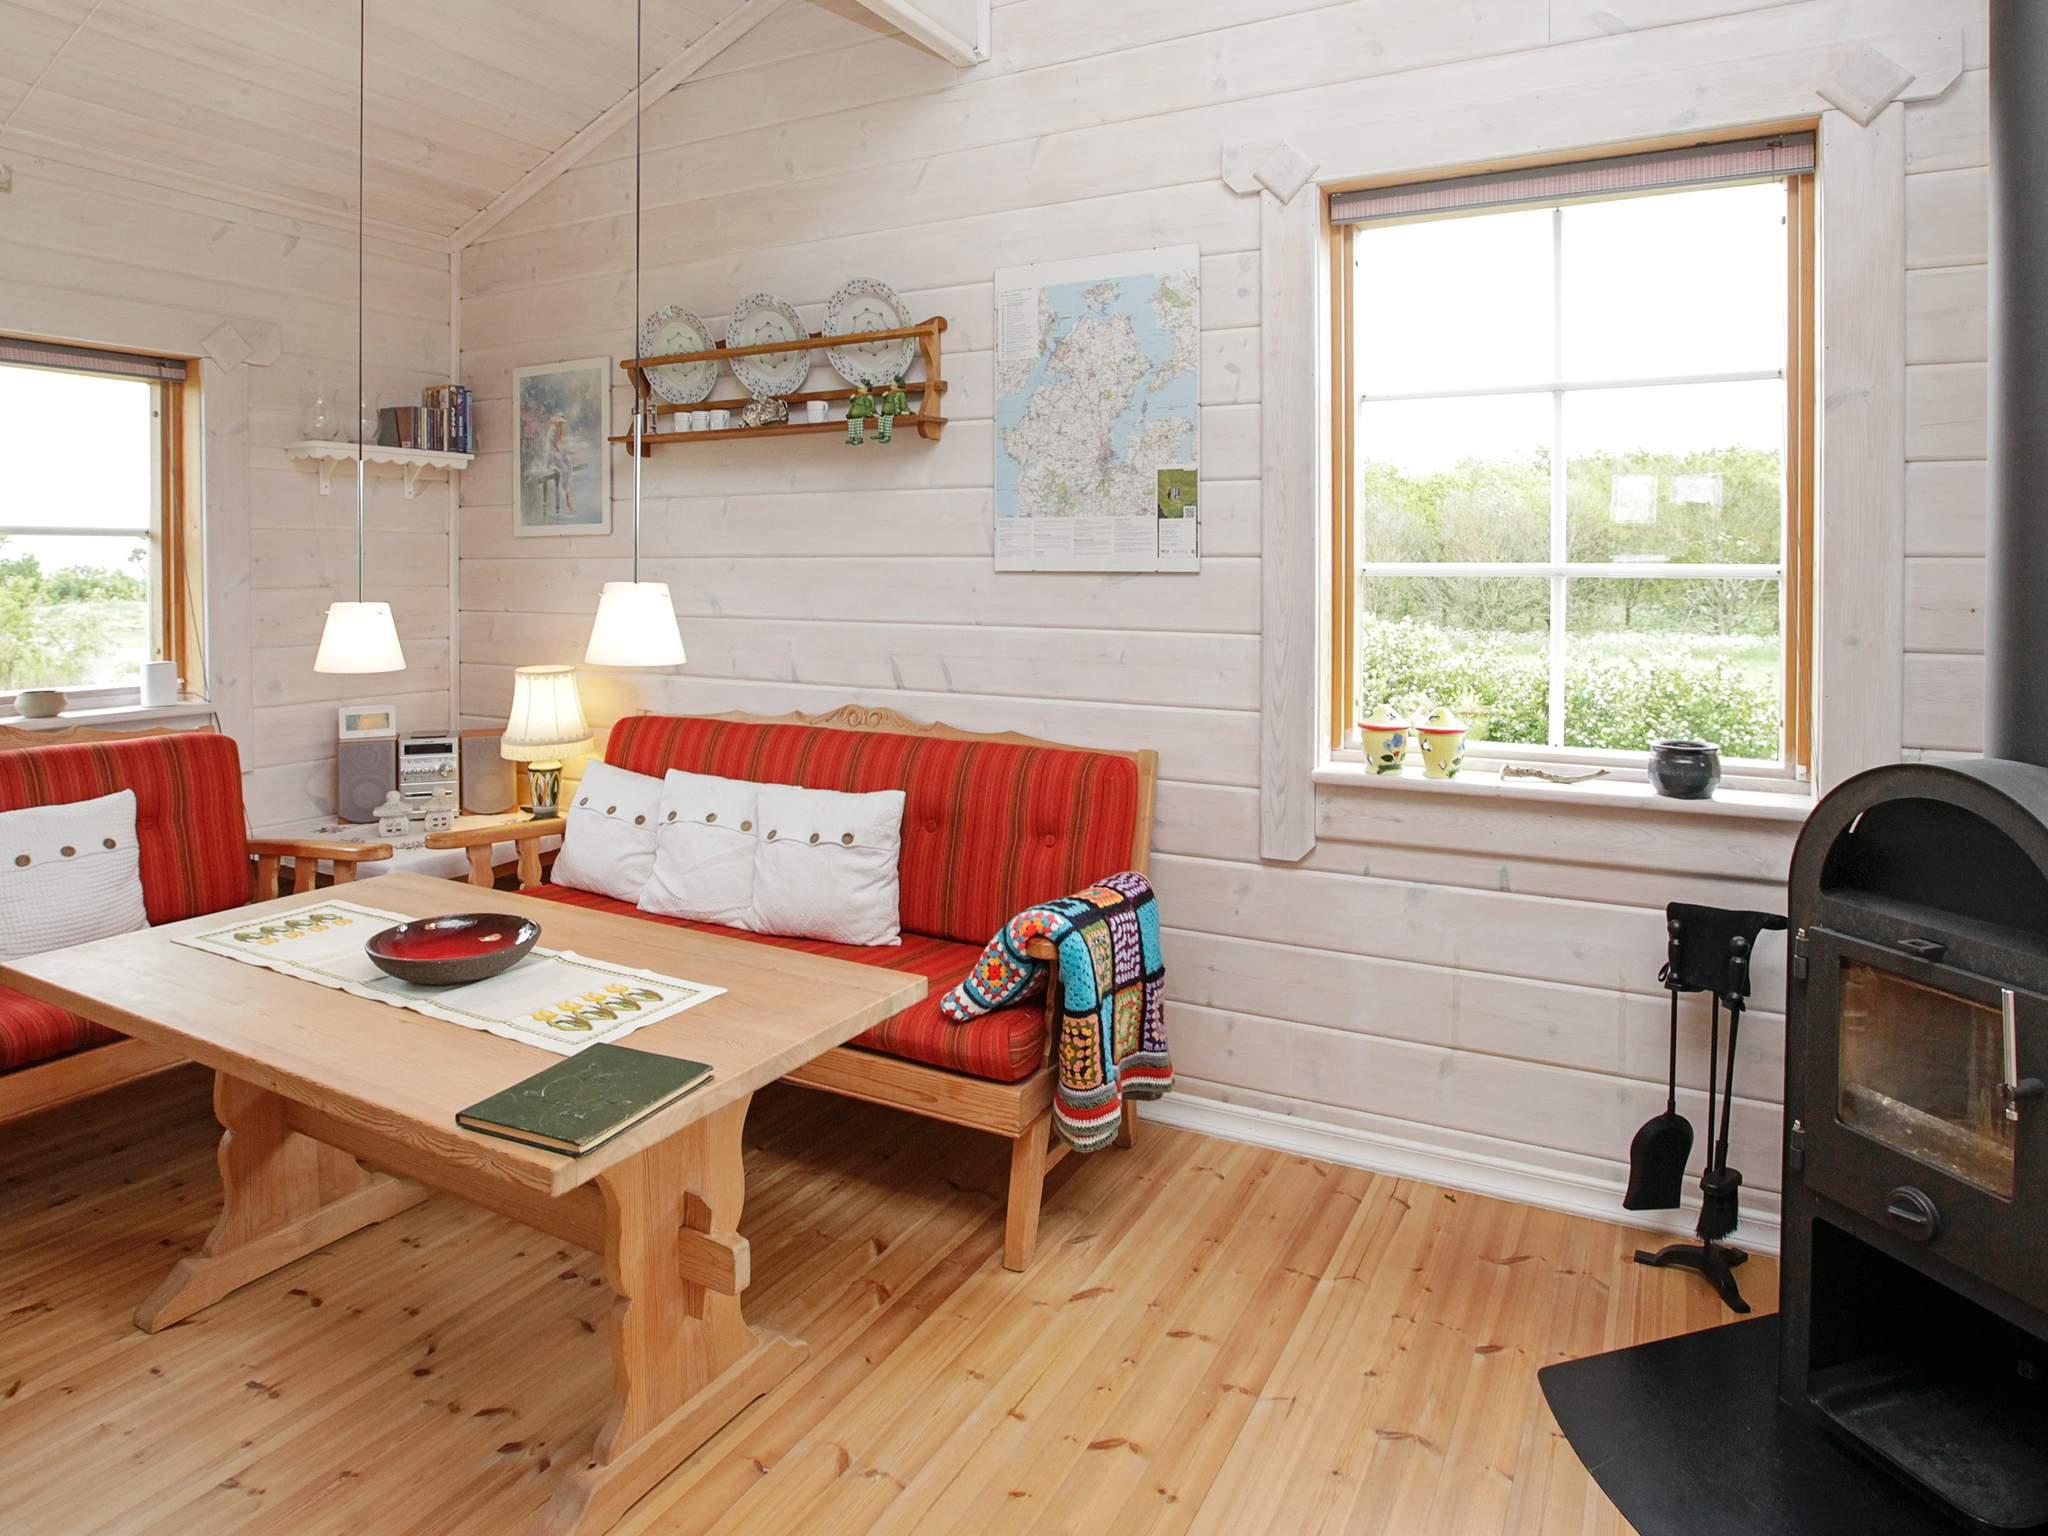 Ferienhaus Eskov Strandpark (603988), Roslev, , Limfjord, Dänemark, Bild 2